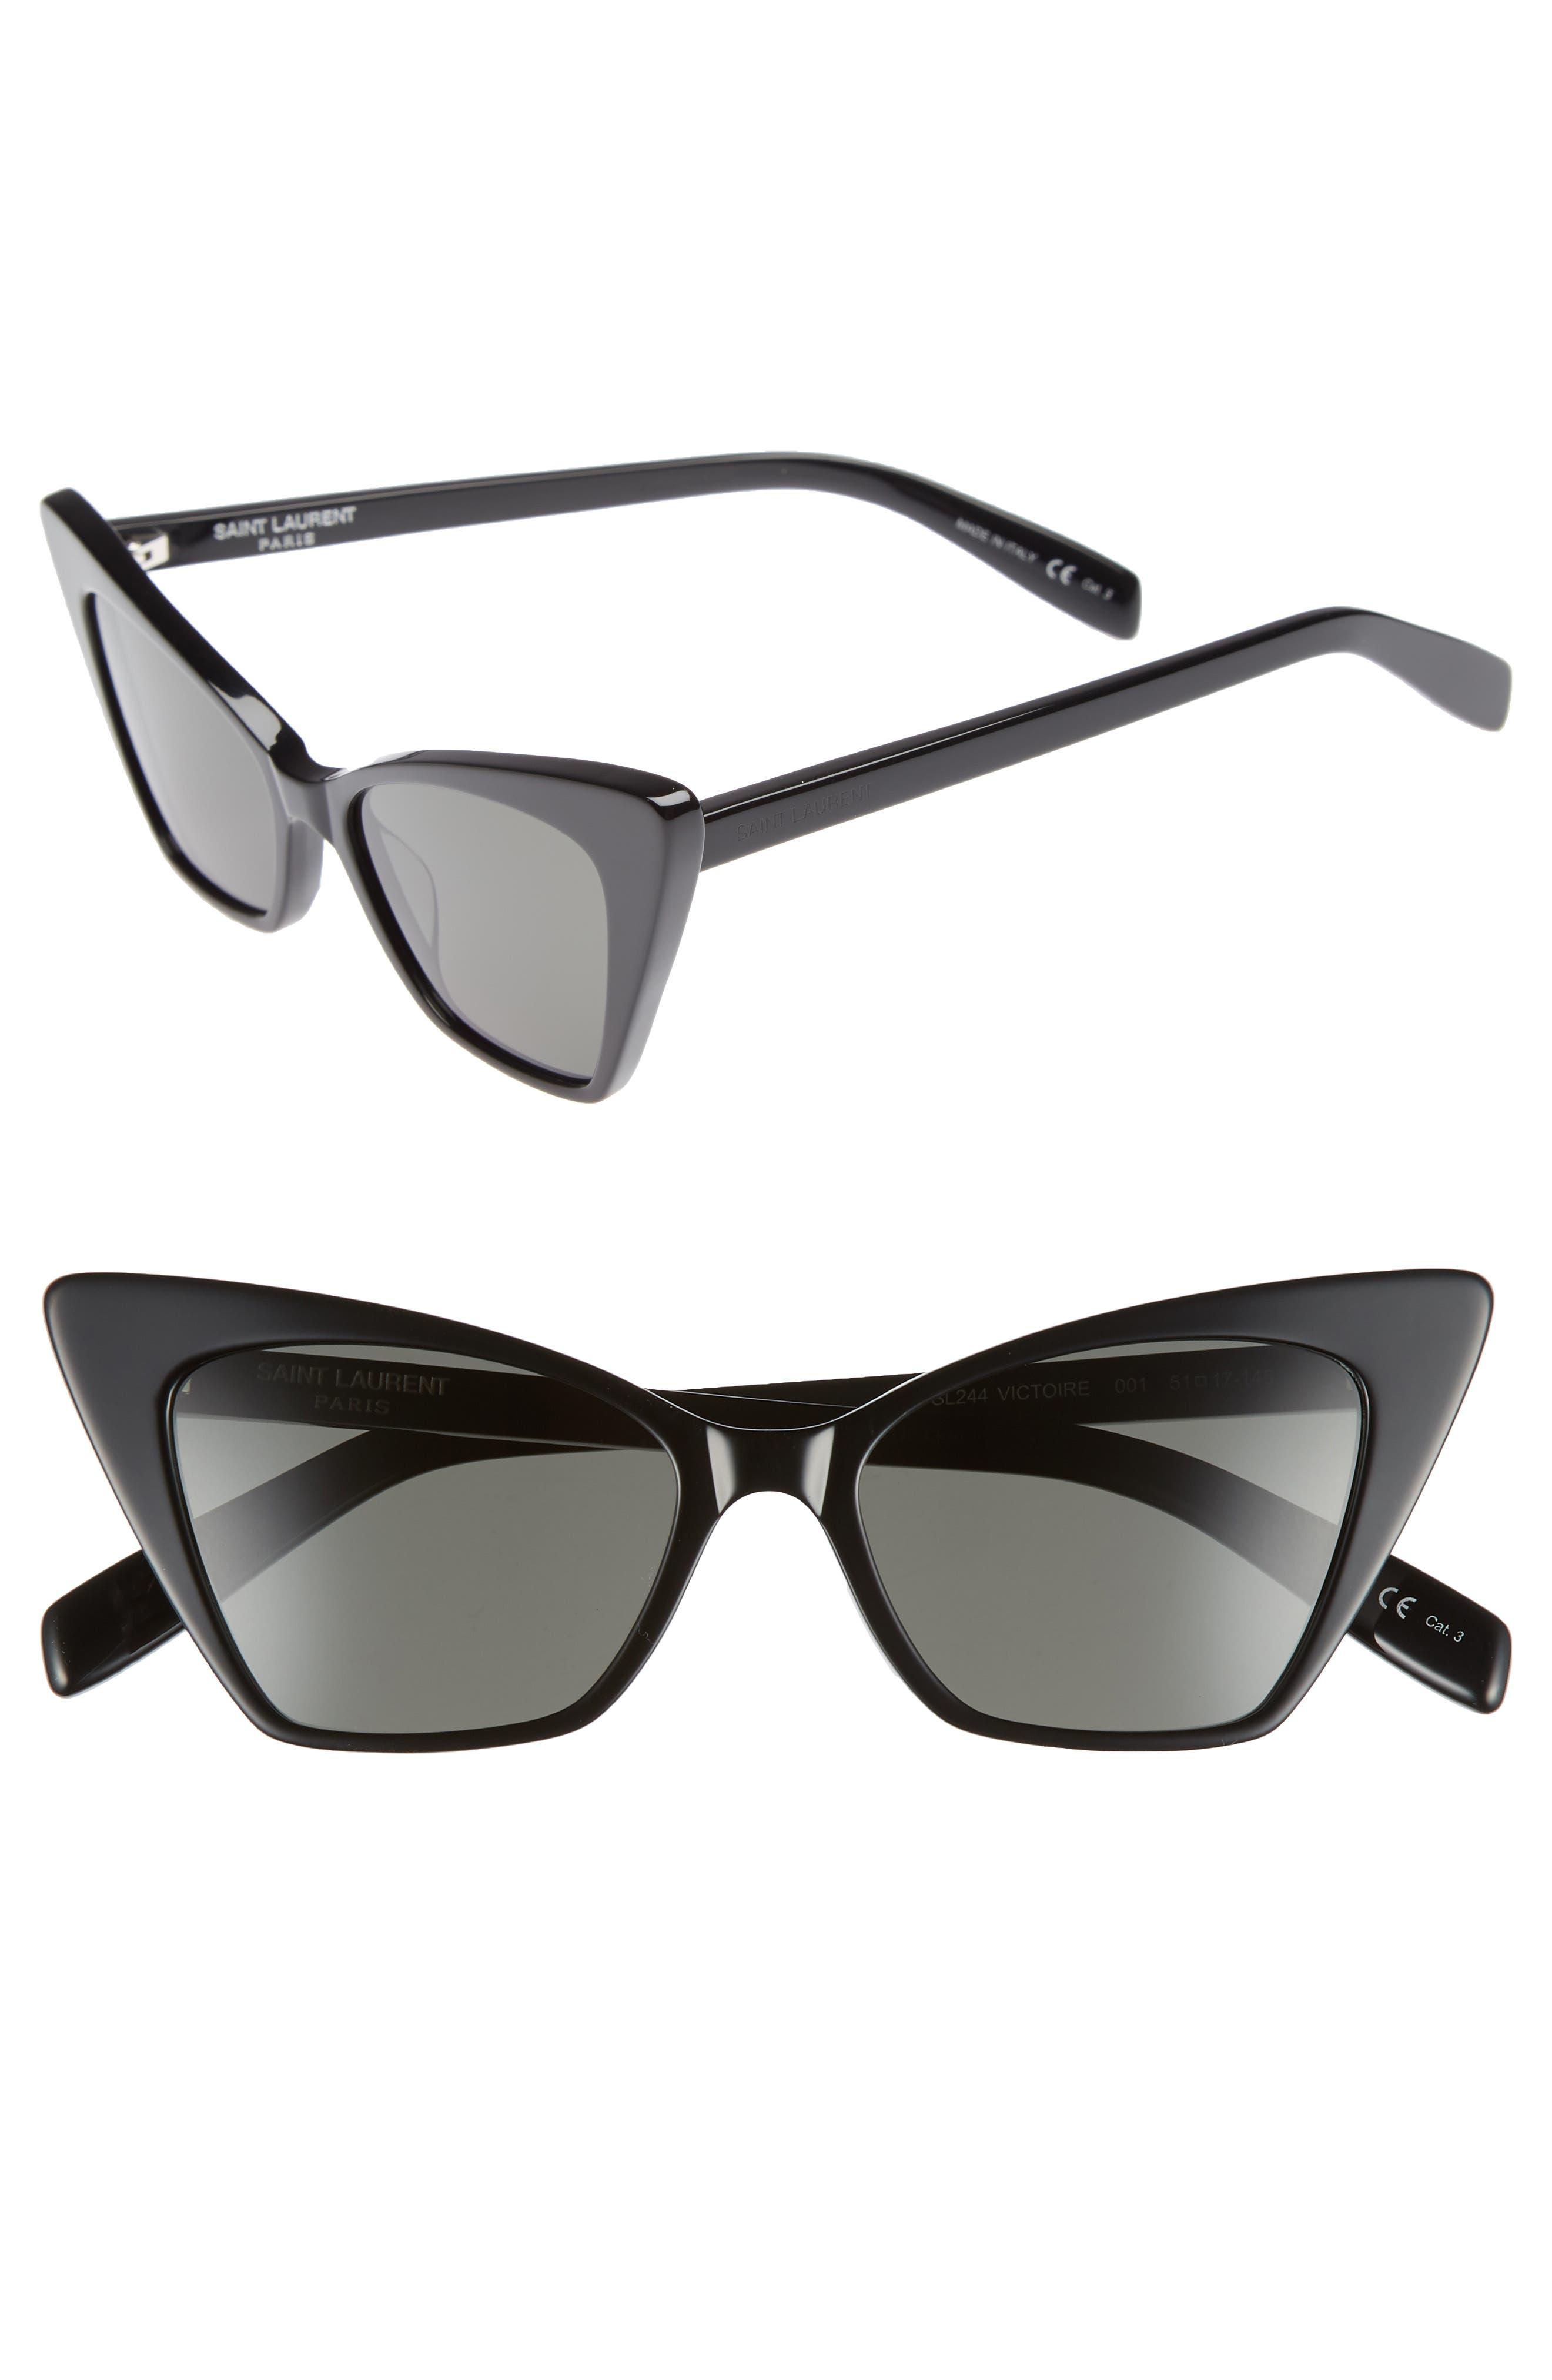 SAINT LAURENT, 51mm Cat Eye Sunglasses, Main thumbnail 1, color, BLACK